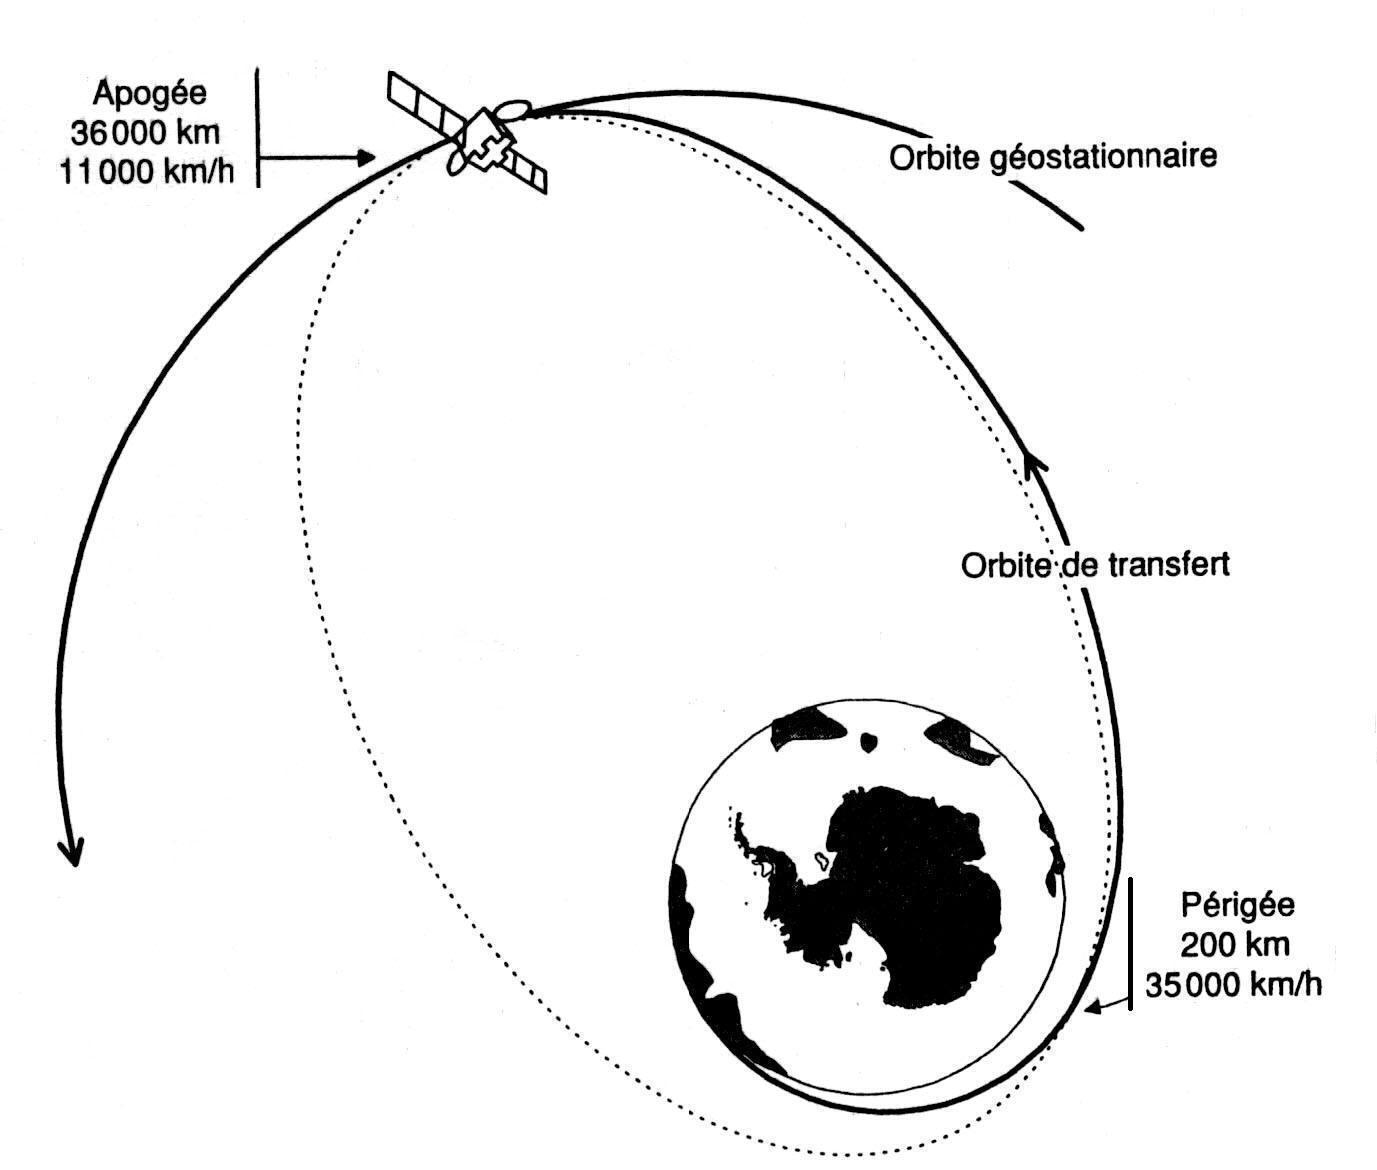 trajectoire satellite geostationnaire